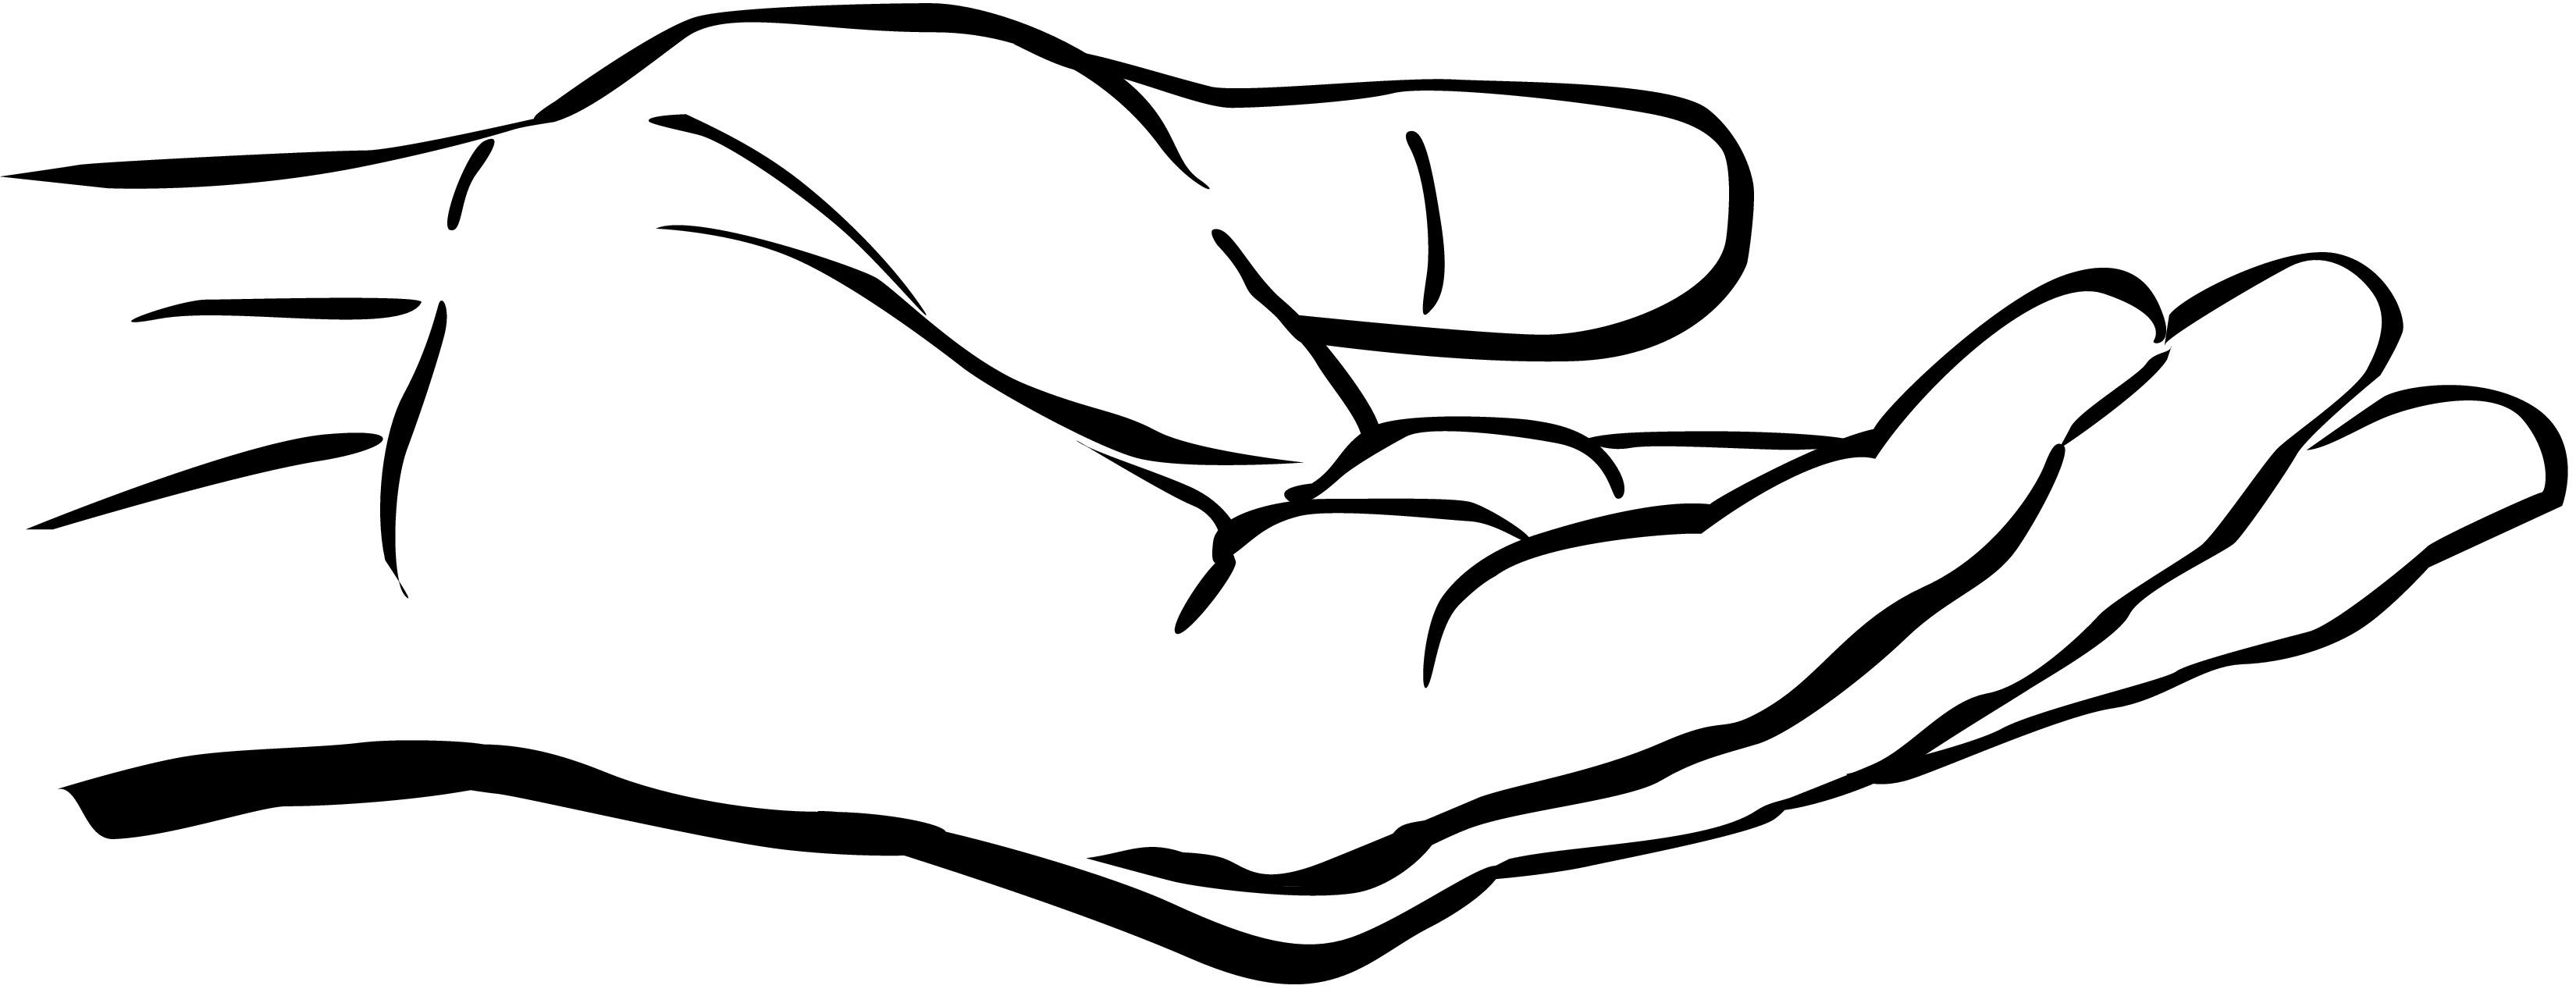 3300x1267 Best Hand Clipart